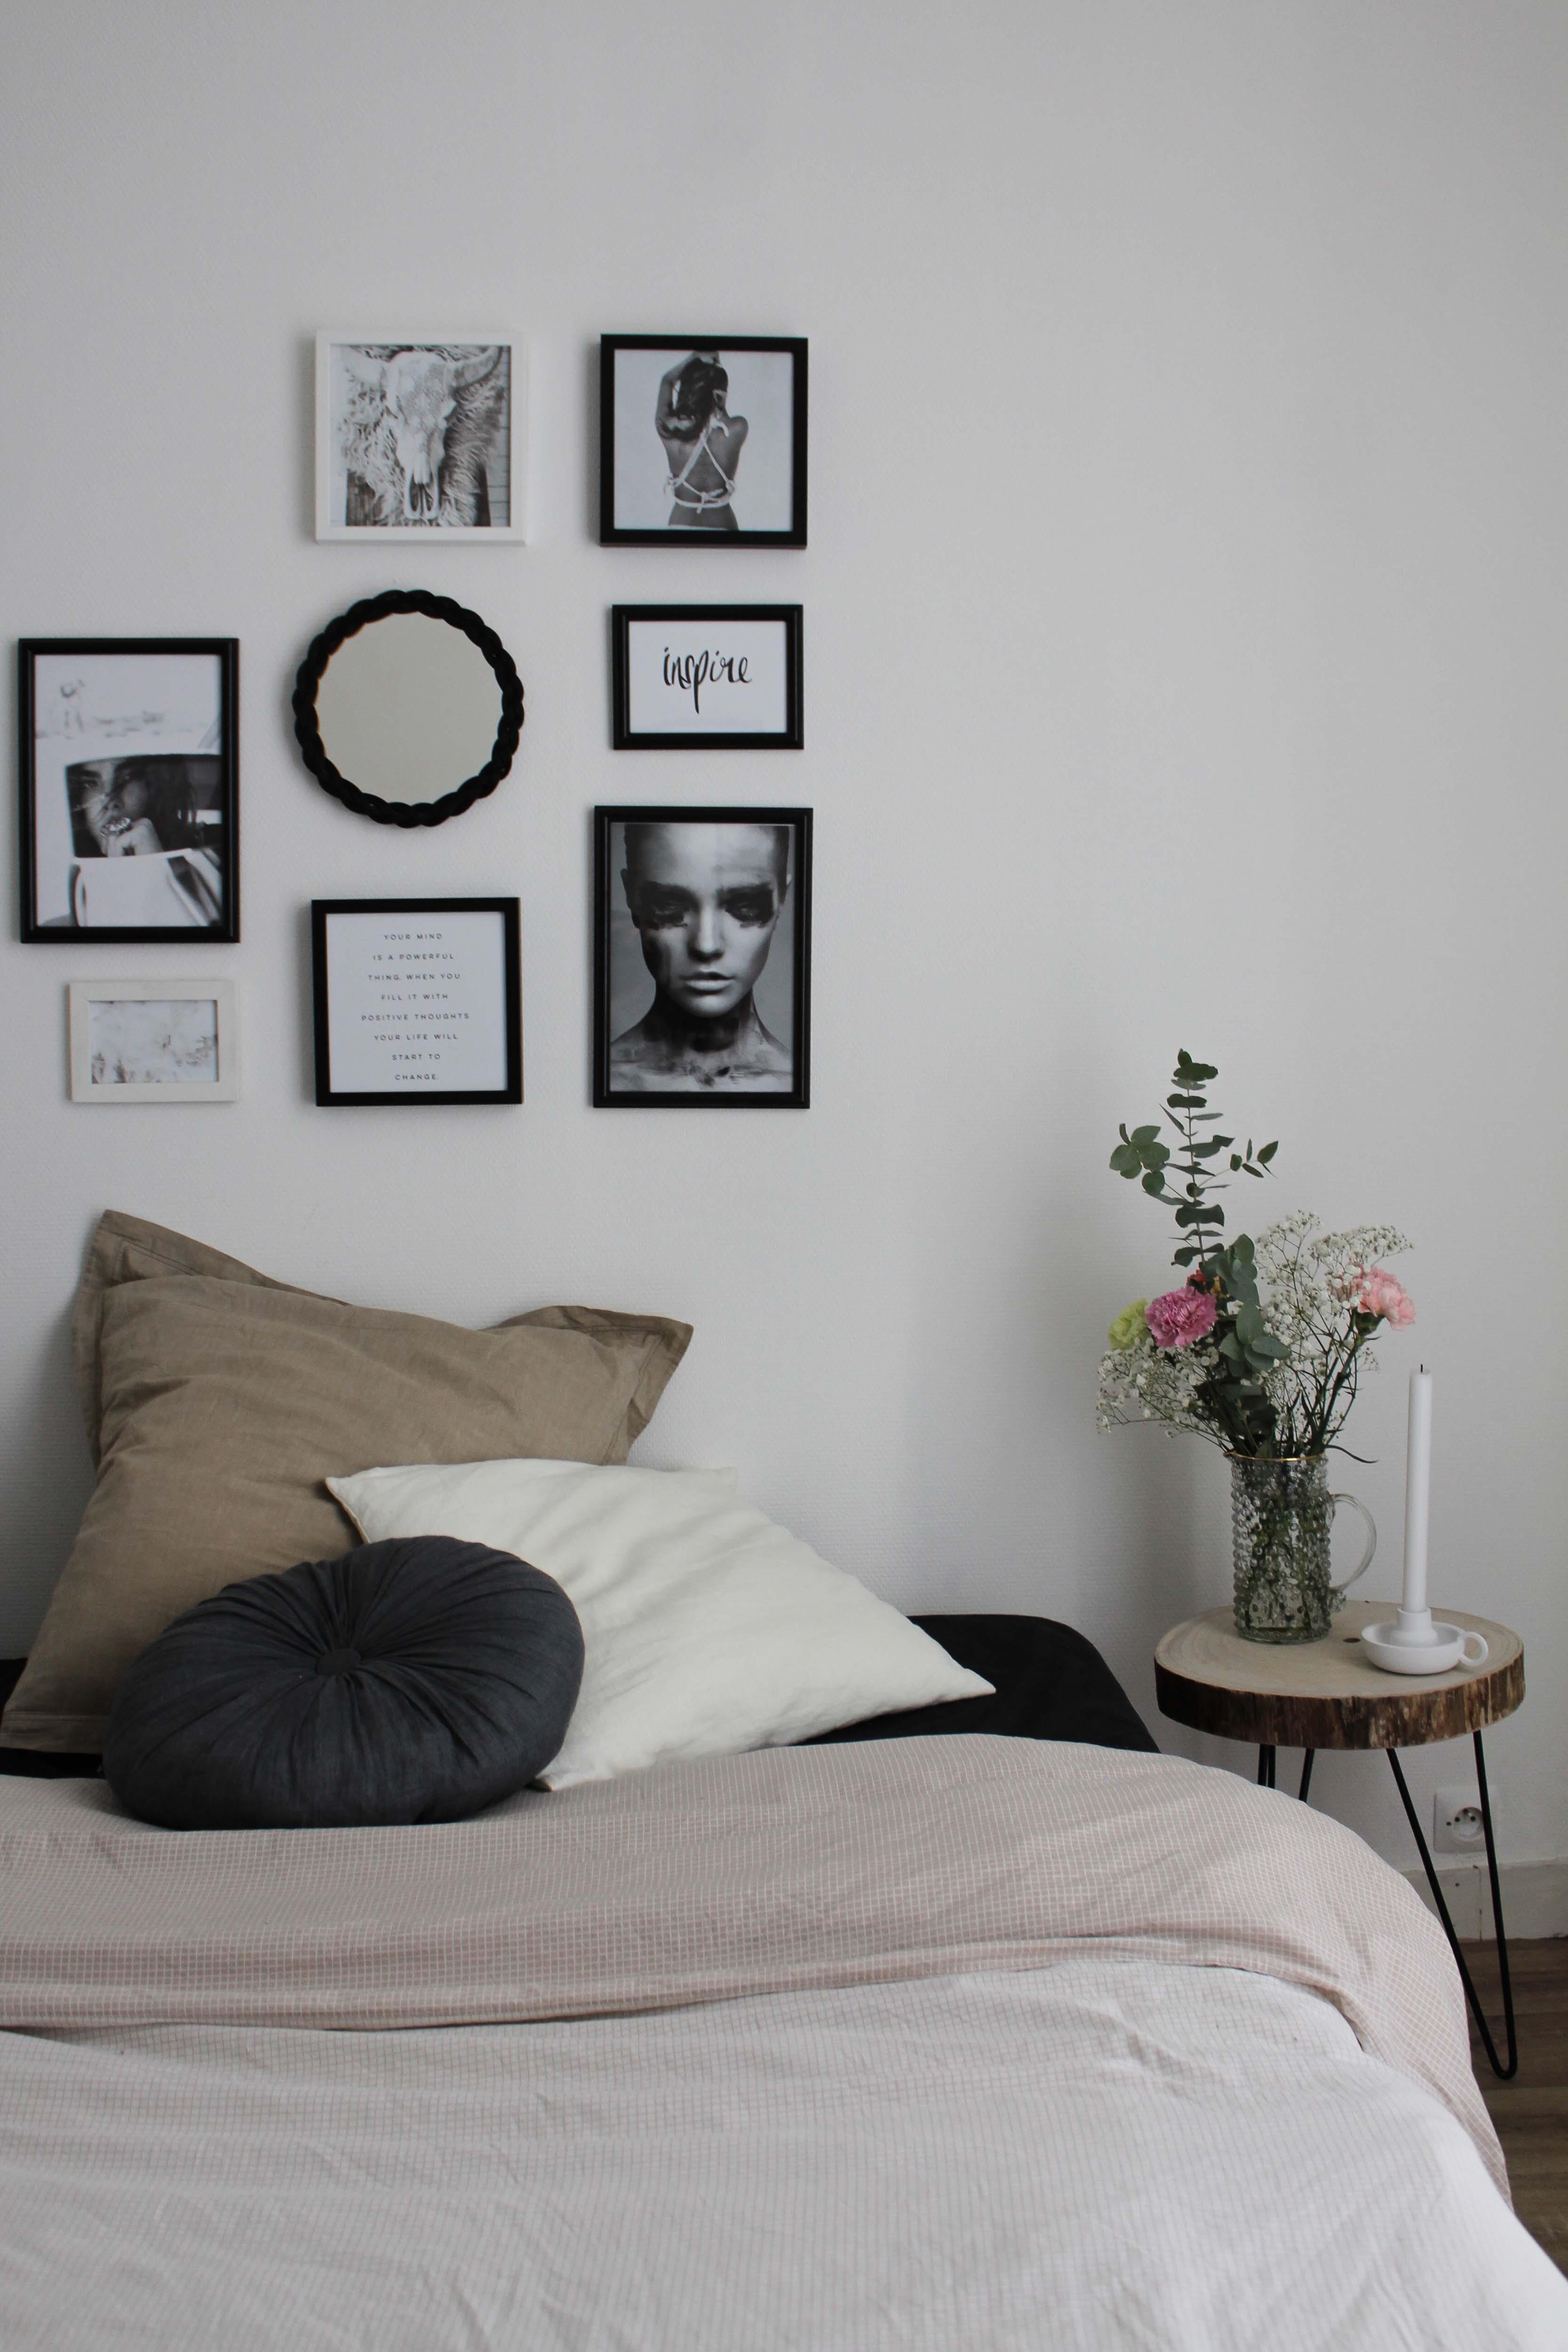 bedroom d co et mur de cadres l 39 instantflo. Black Bedroom Furniture Sets. Home Design Ideas